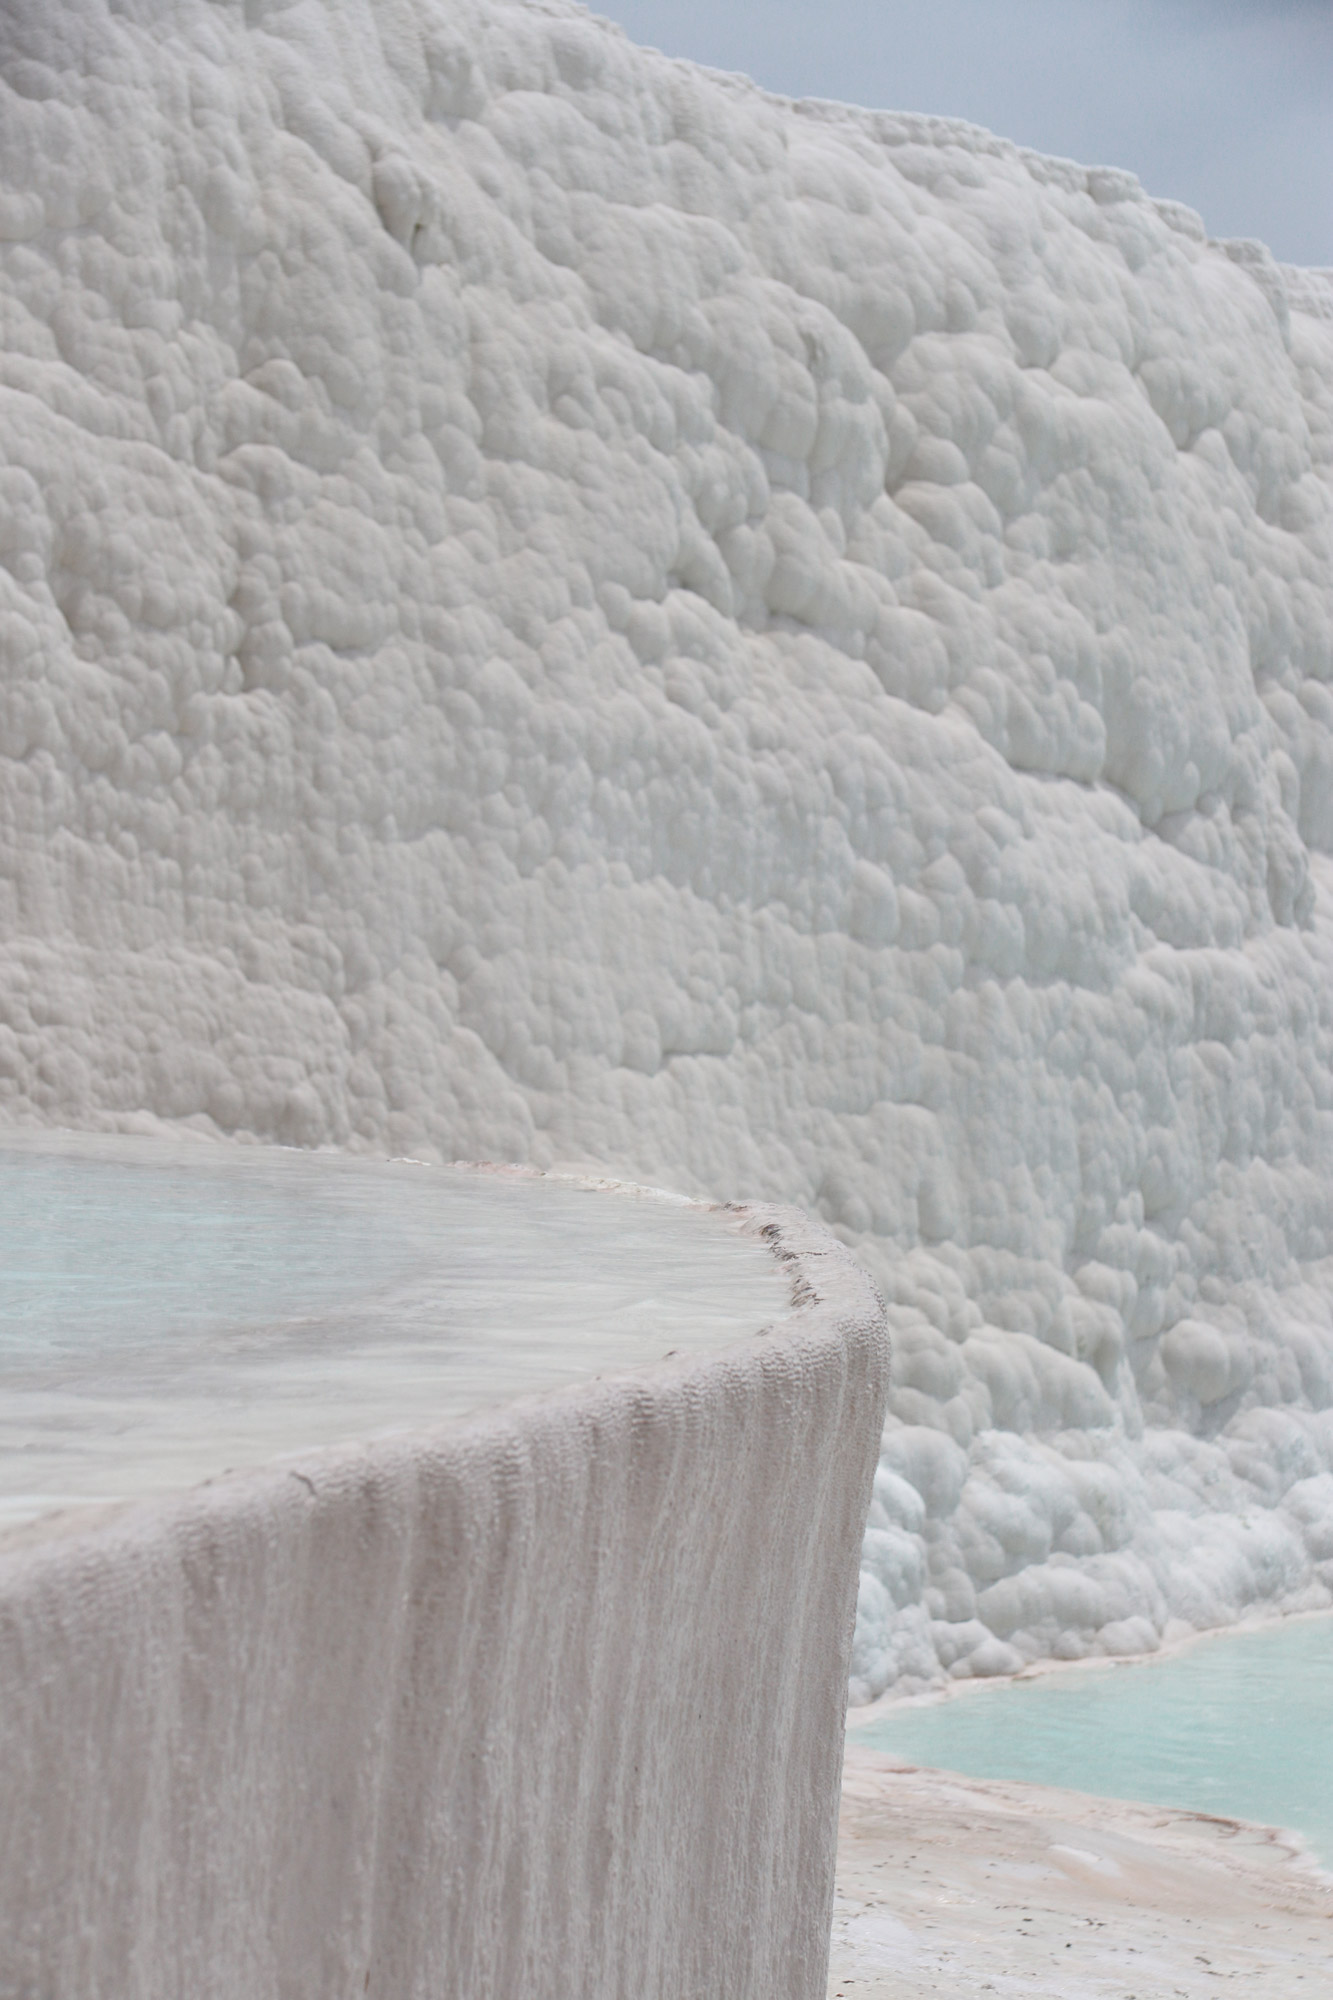 Turkije reisverslag: Pamukkale en Hiërapolis - Kunstmatige terrassen